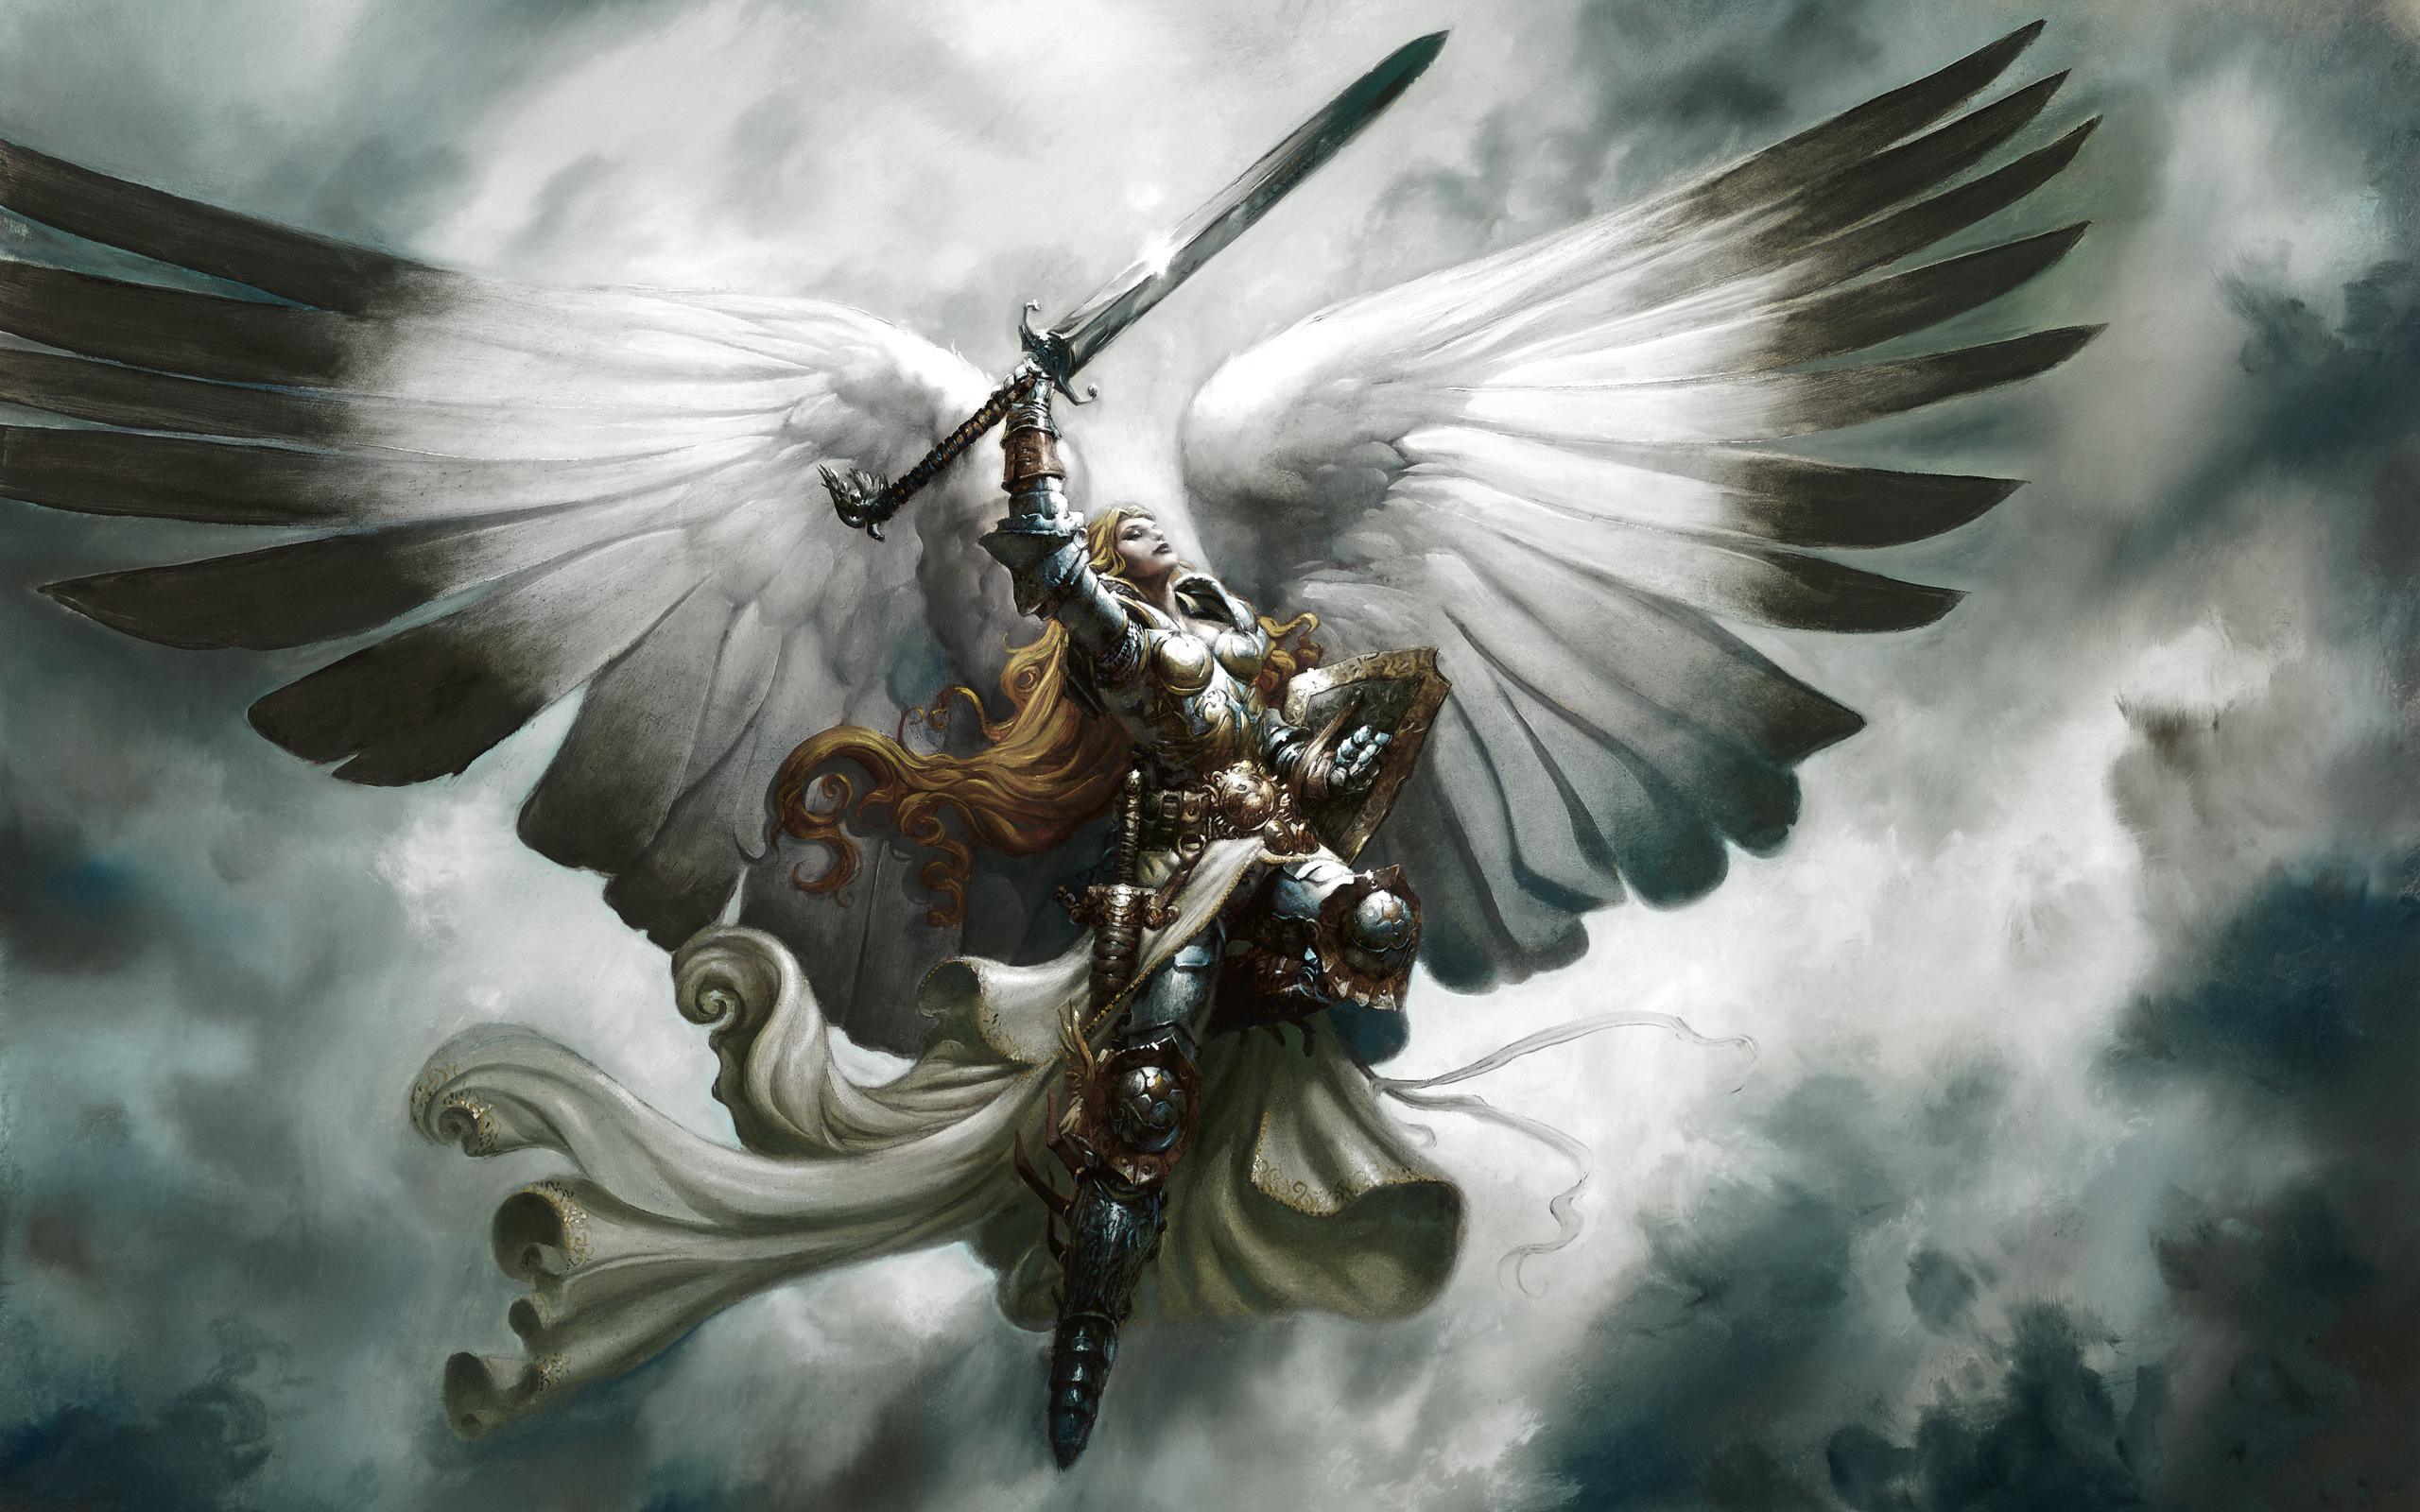 wings fantasy angel war anime art Wallpaper Anime Wallpaper 2560x1600